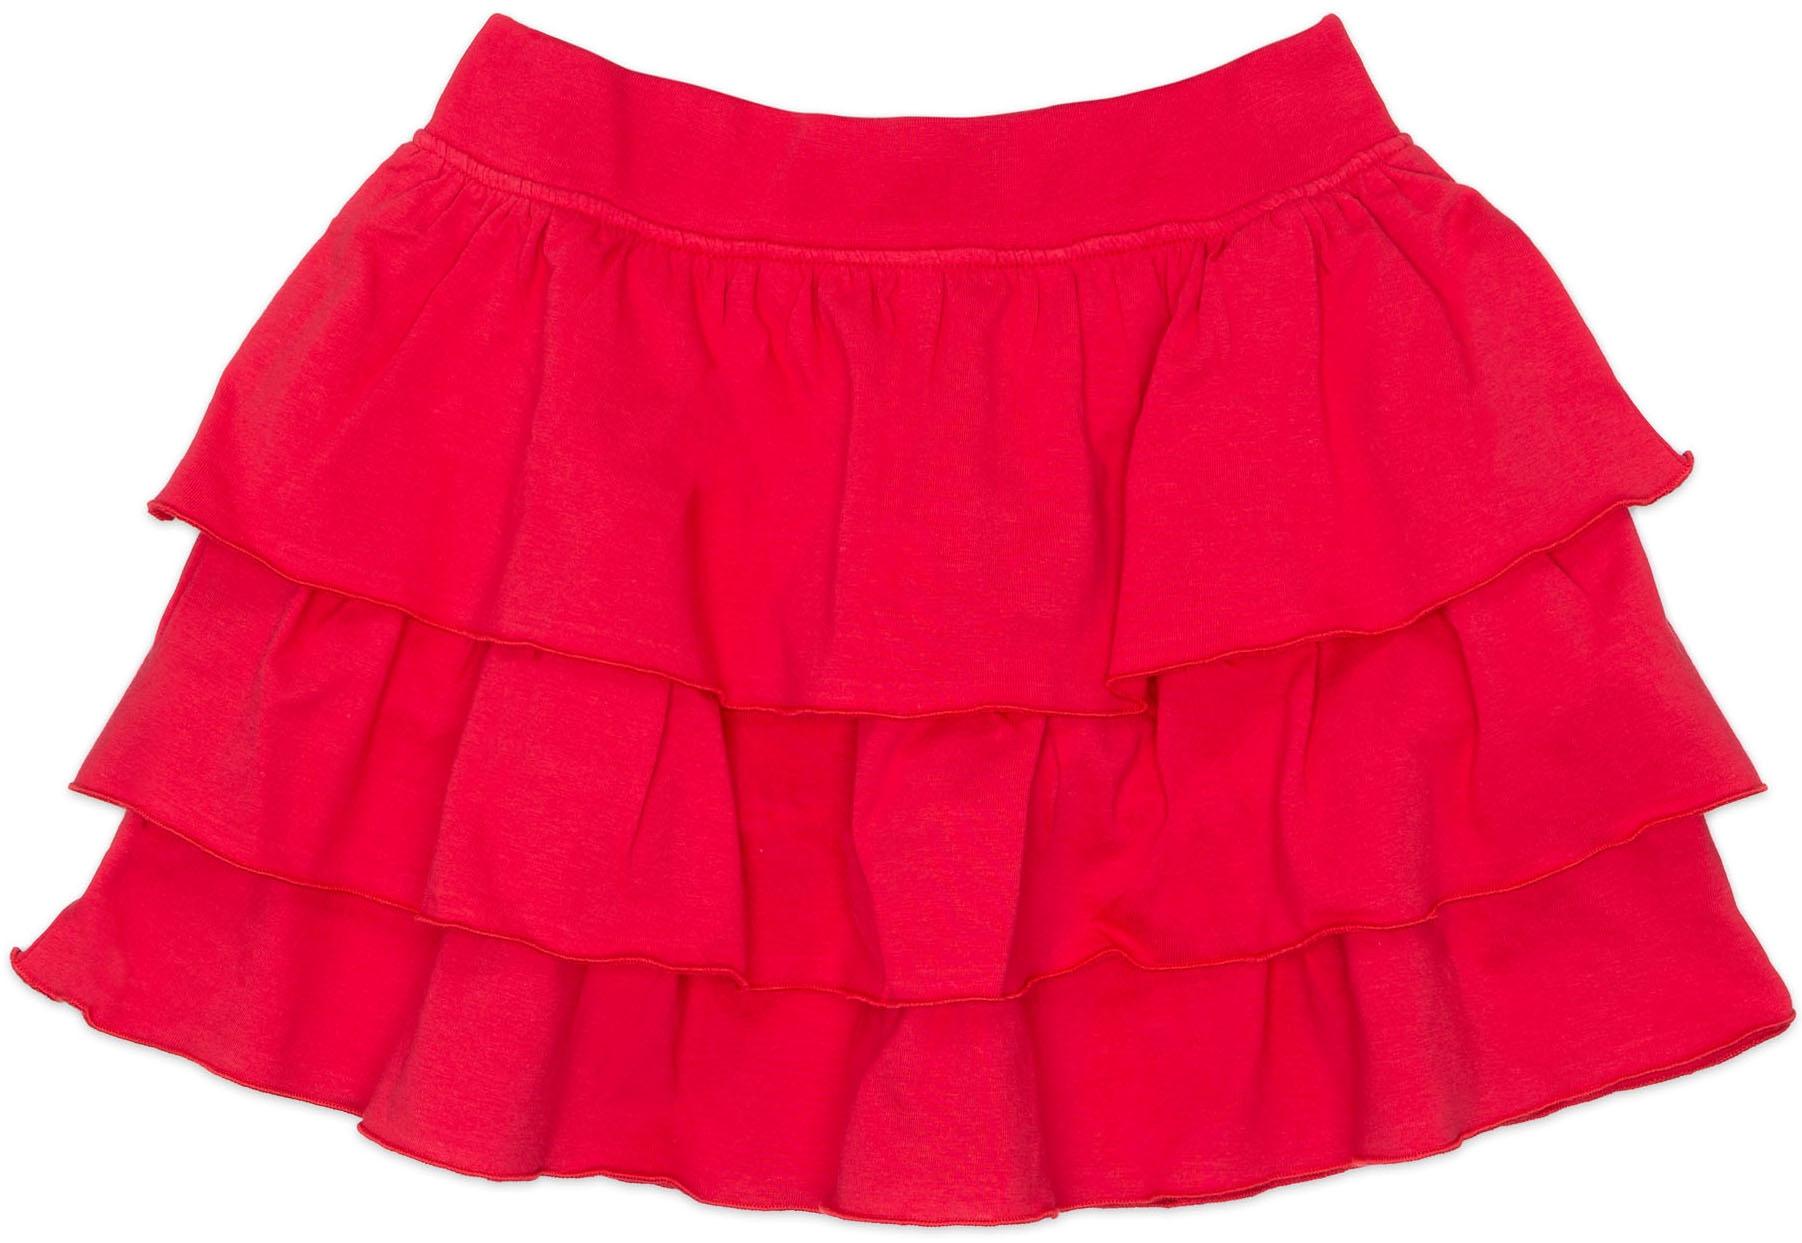 Юбки Barkito Бон Вояж красная юбка трикотажная barkito бон вояж синяя